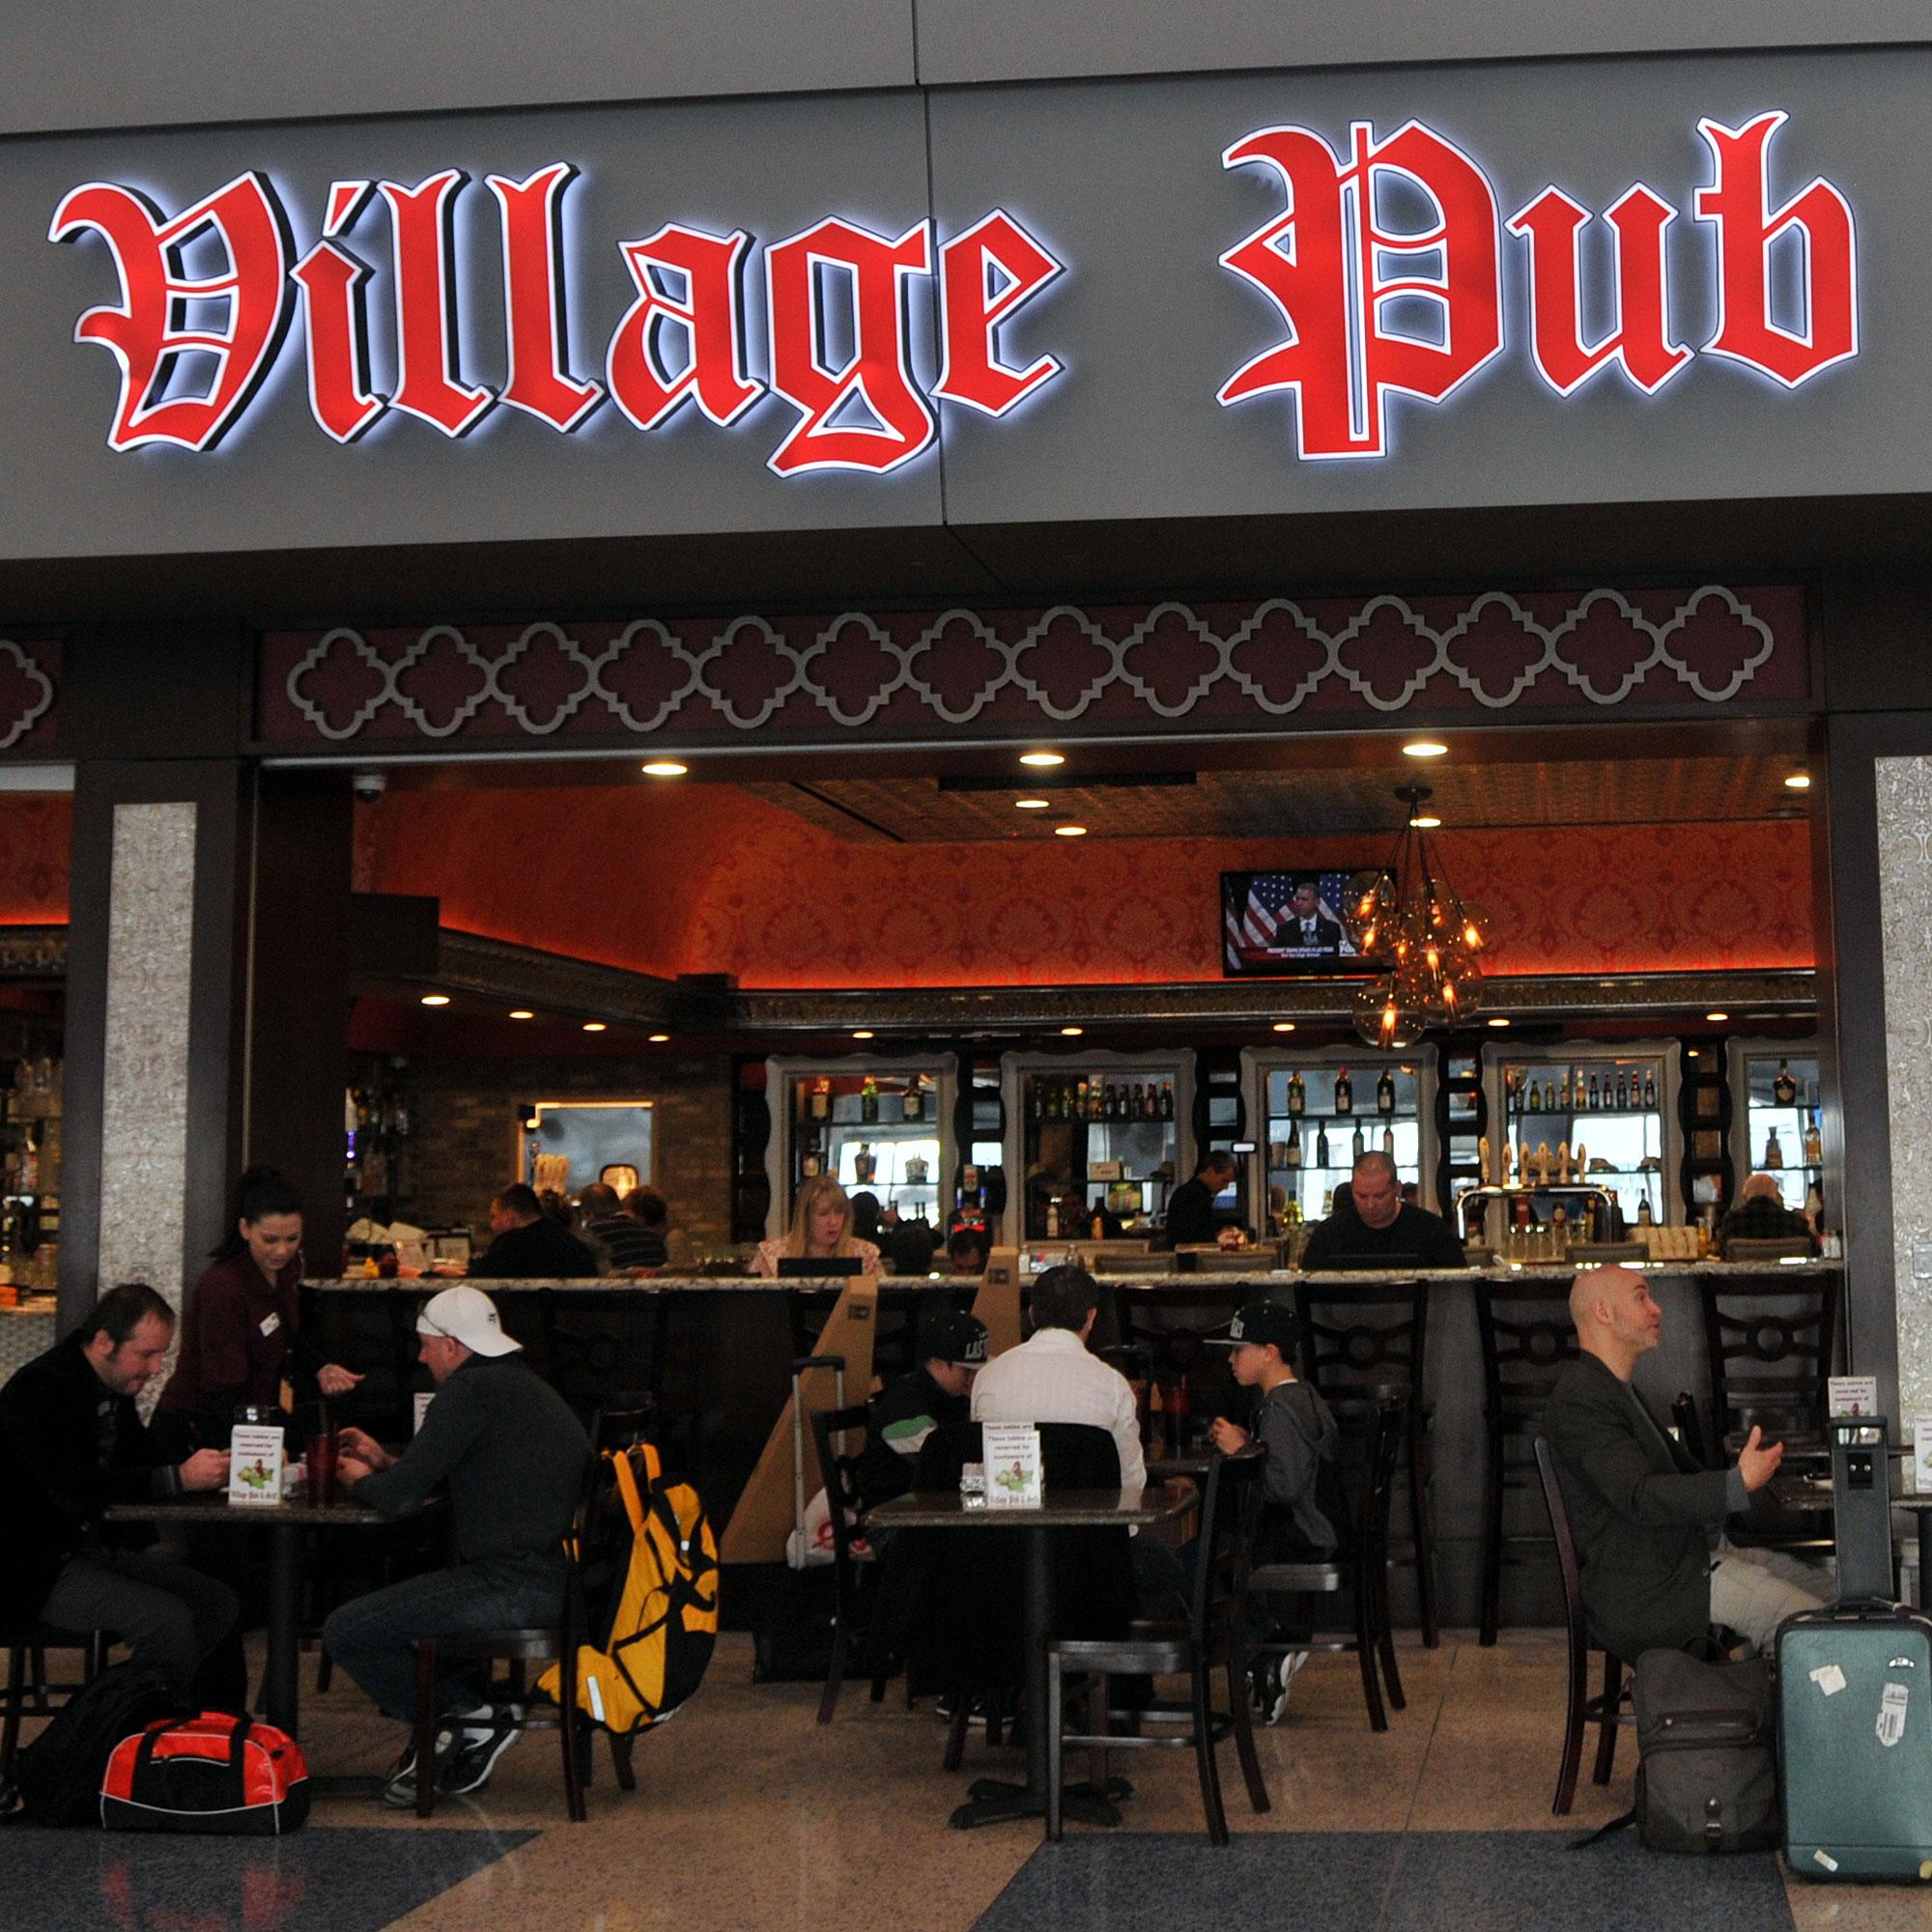 Village pub las vegas : Asian store baltimore